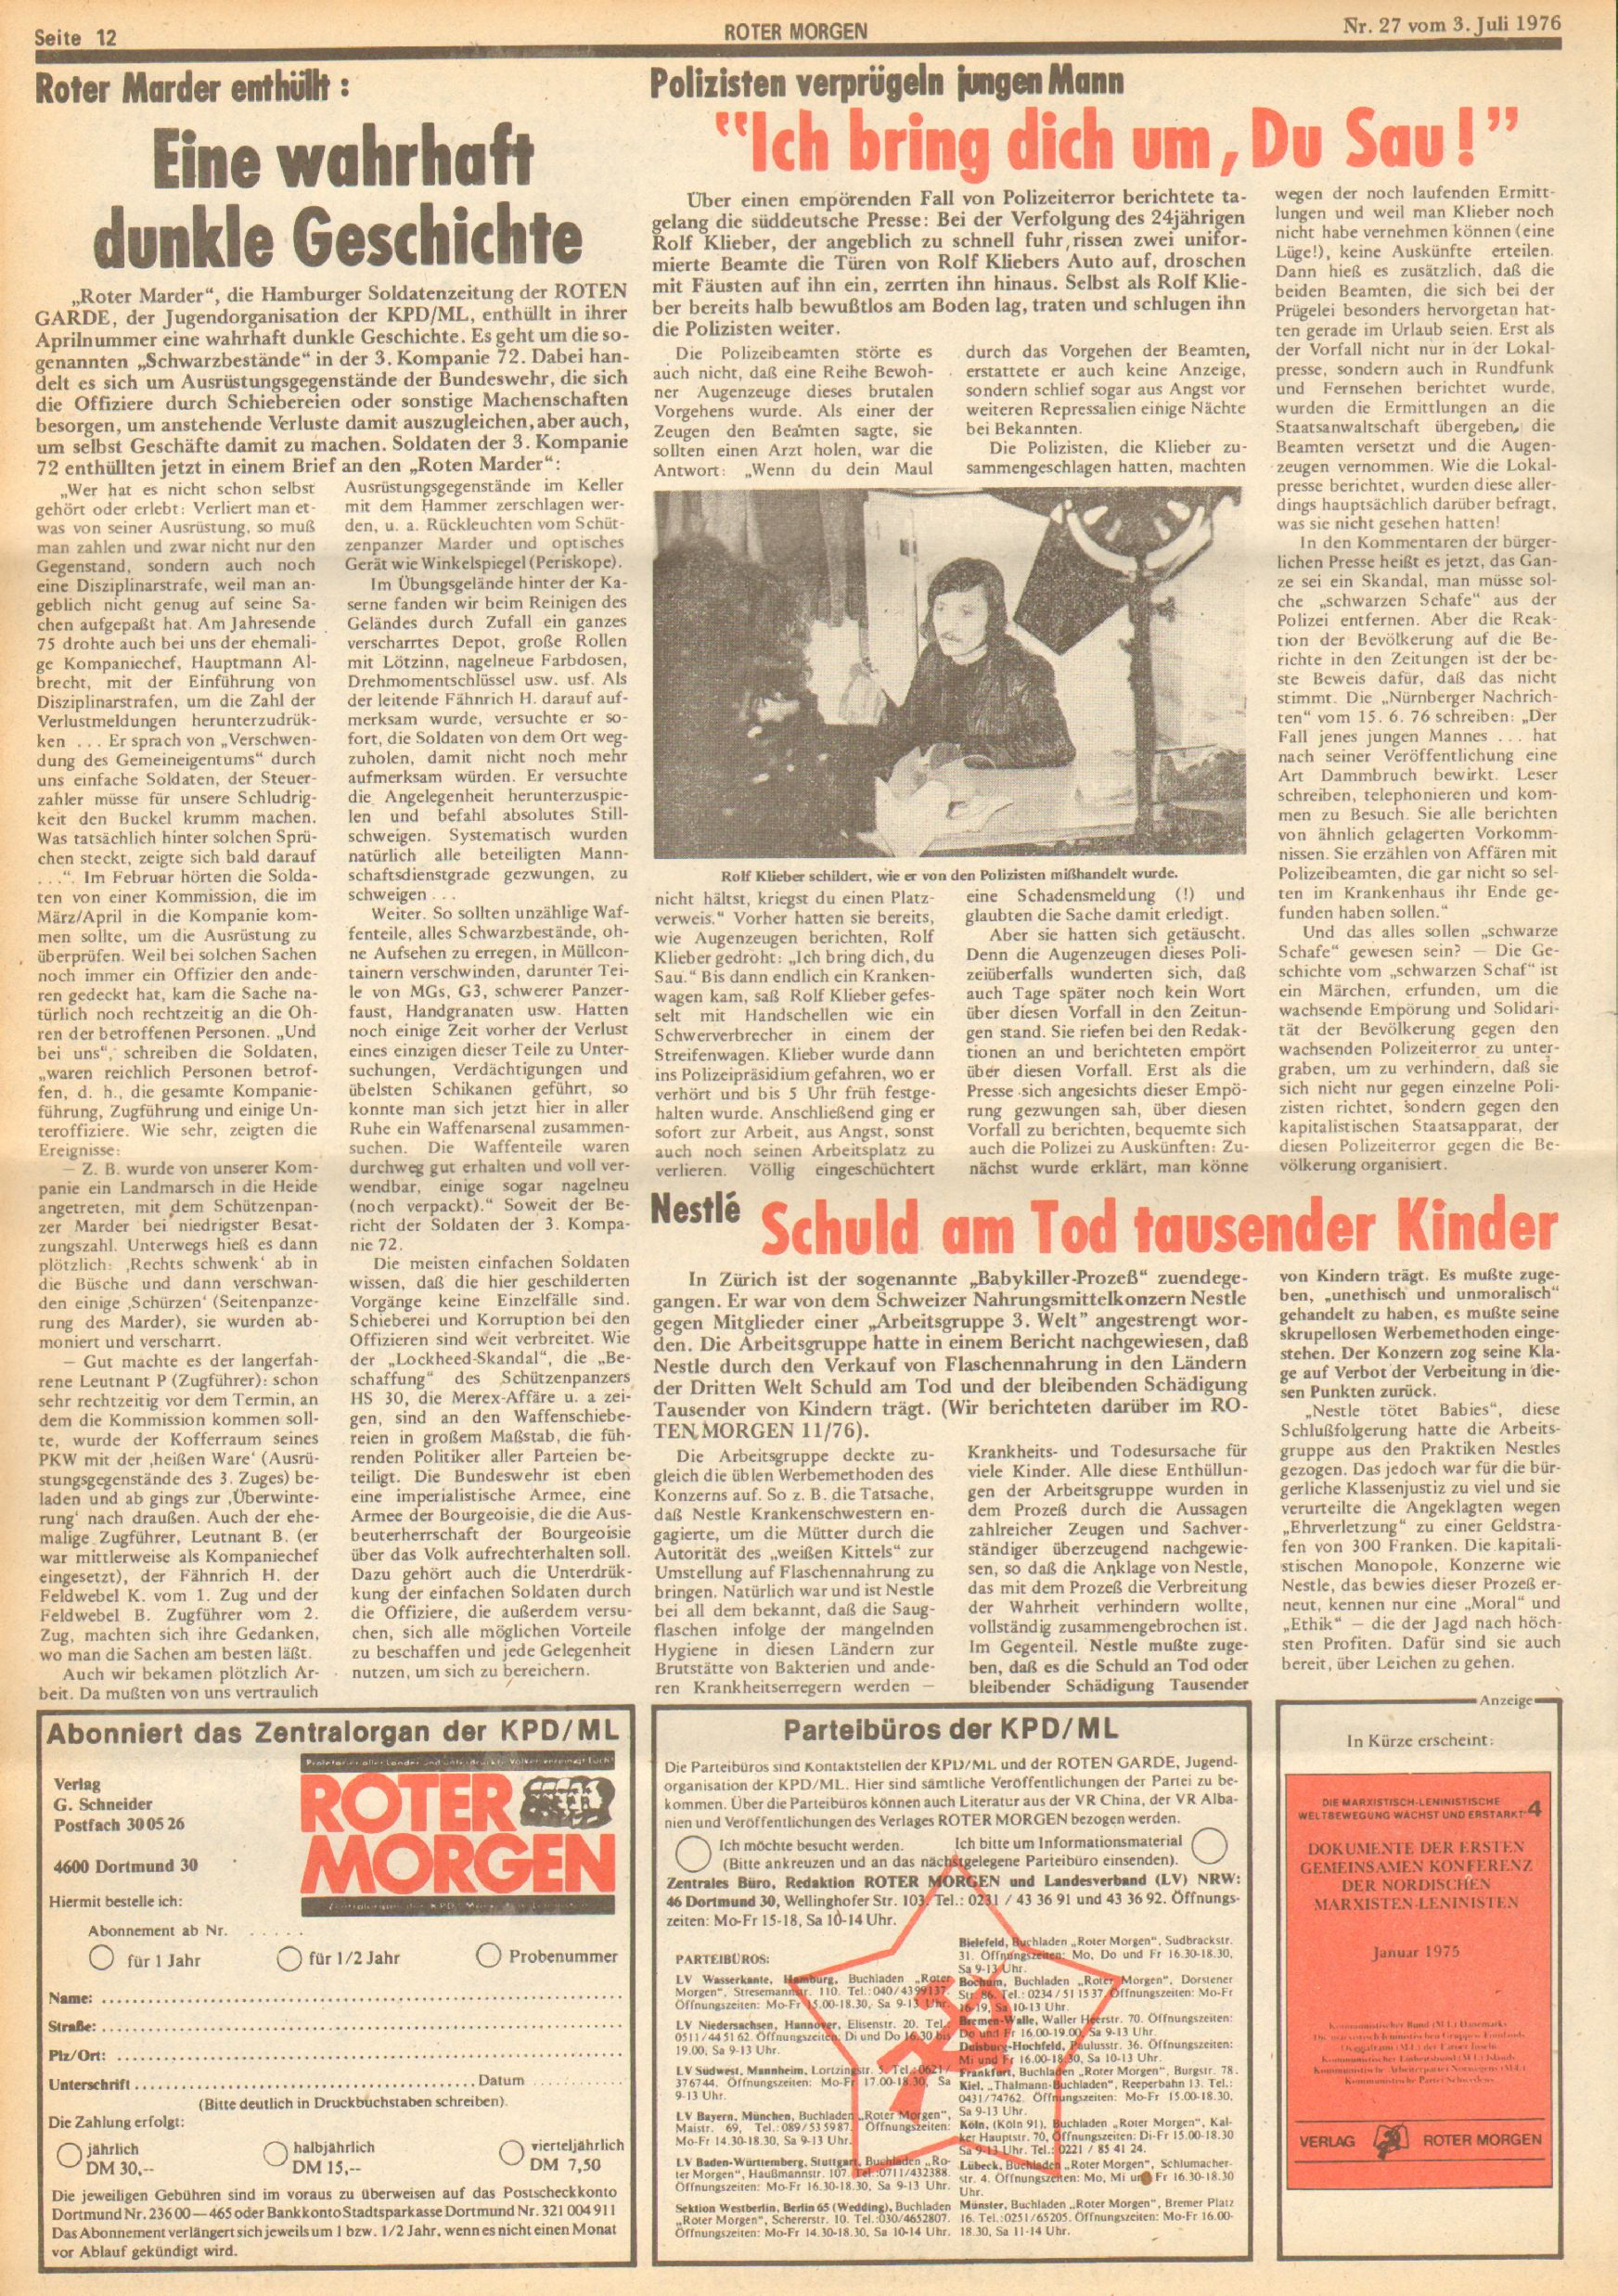 Roter Morgen, 10. Jg., 3. Juli 1976, Nr. 27, Seite 12